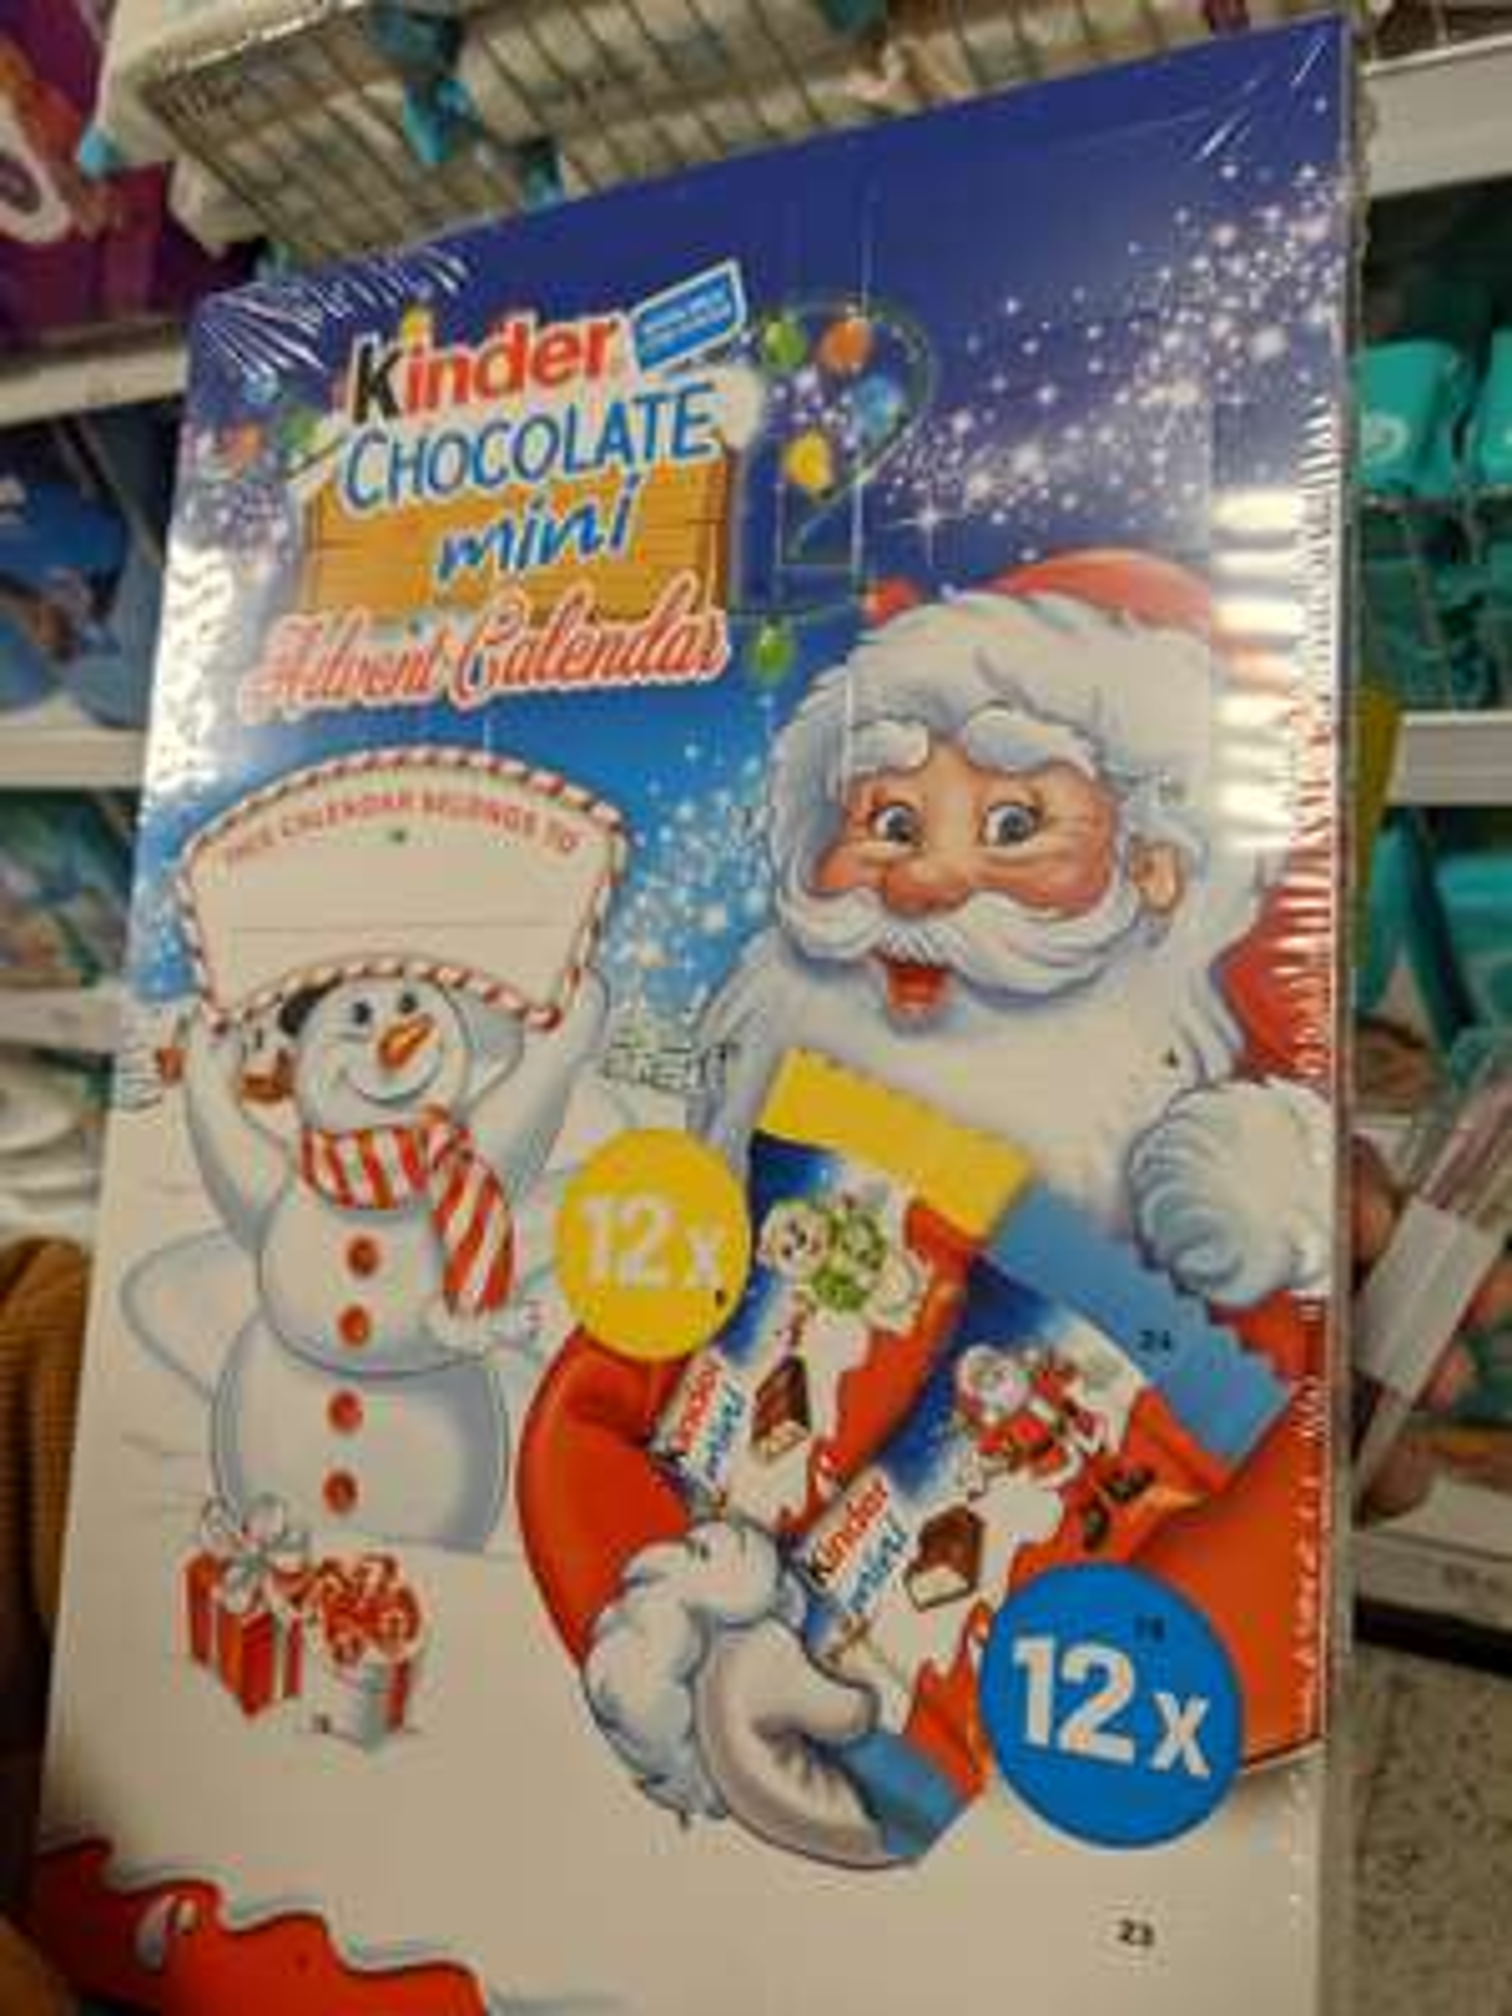 Kinder advent calendar - 99p Instore @ Home Bargains (Ashton)